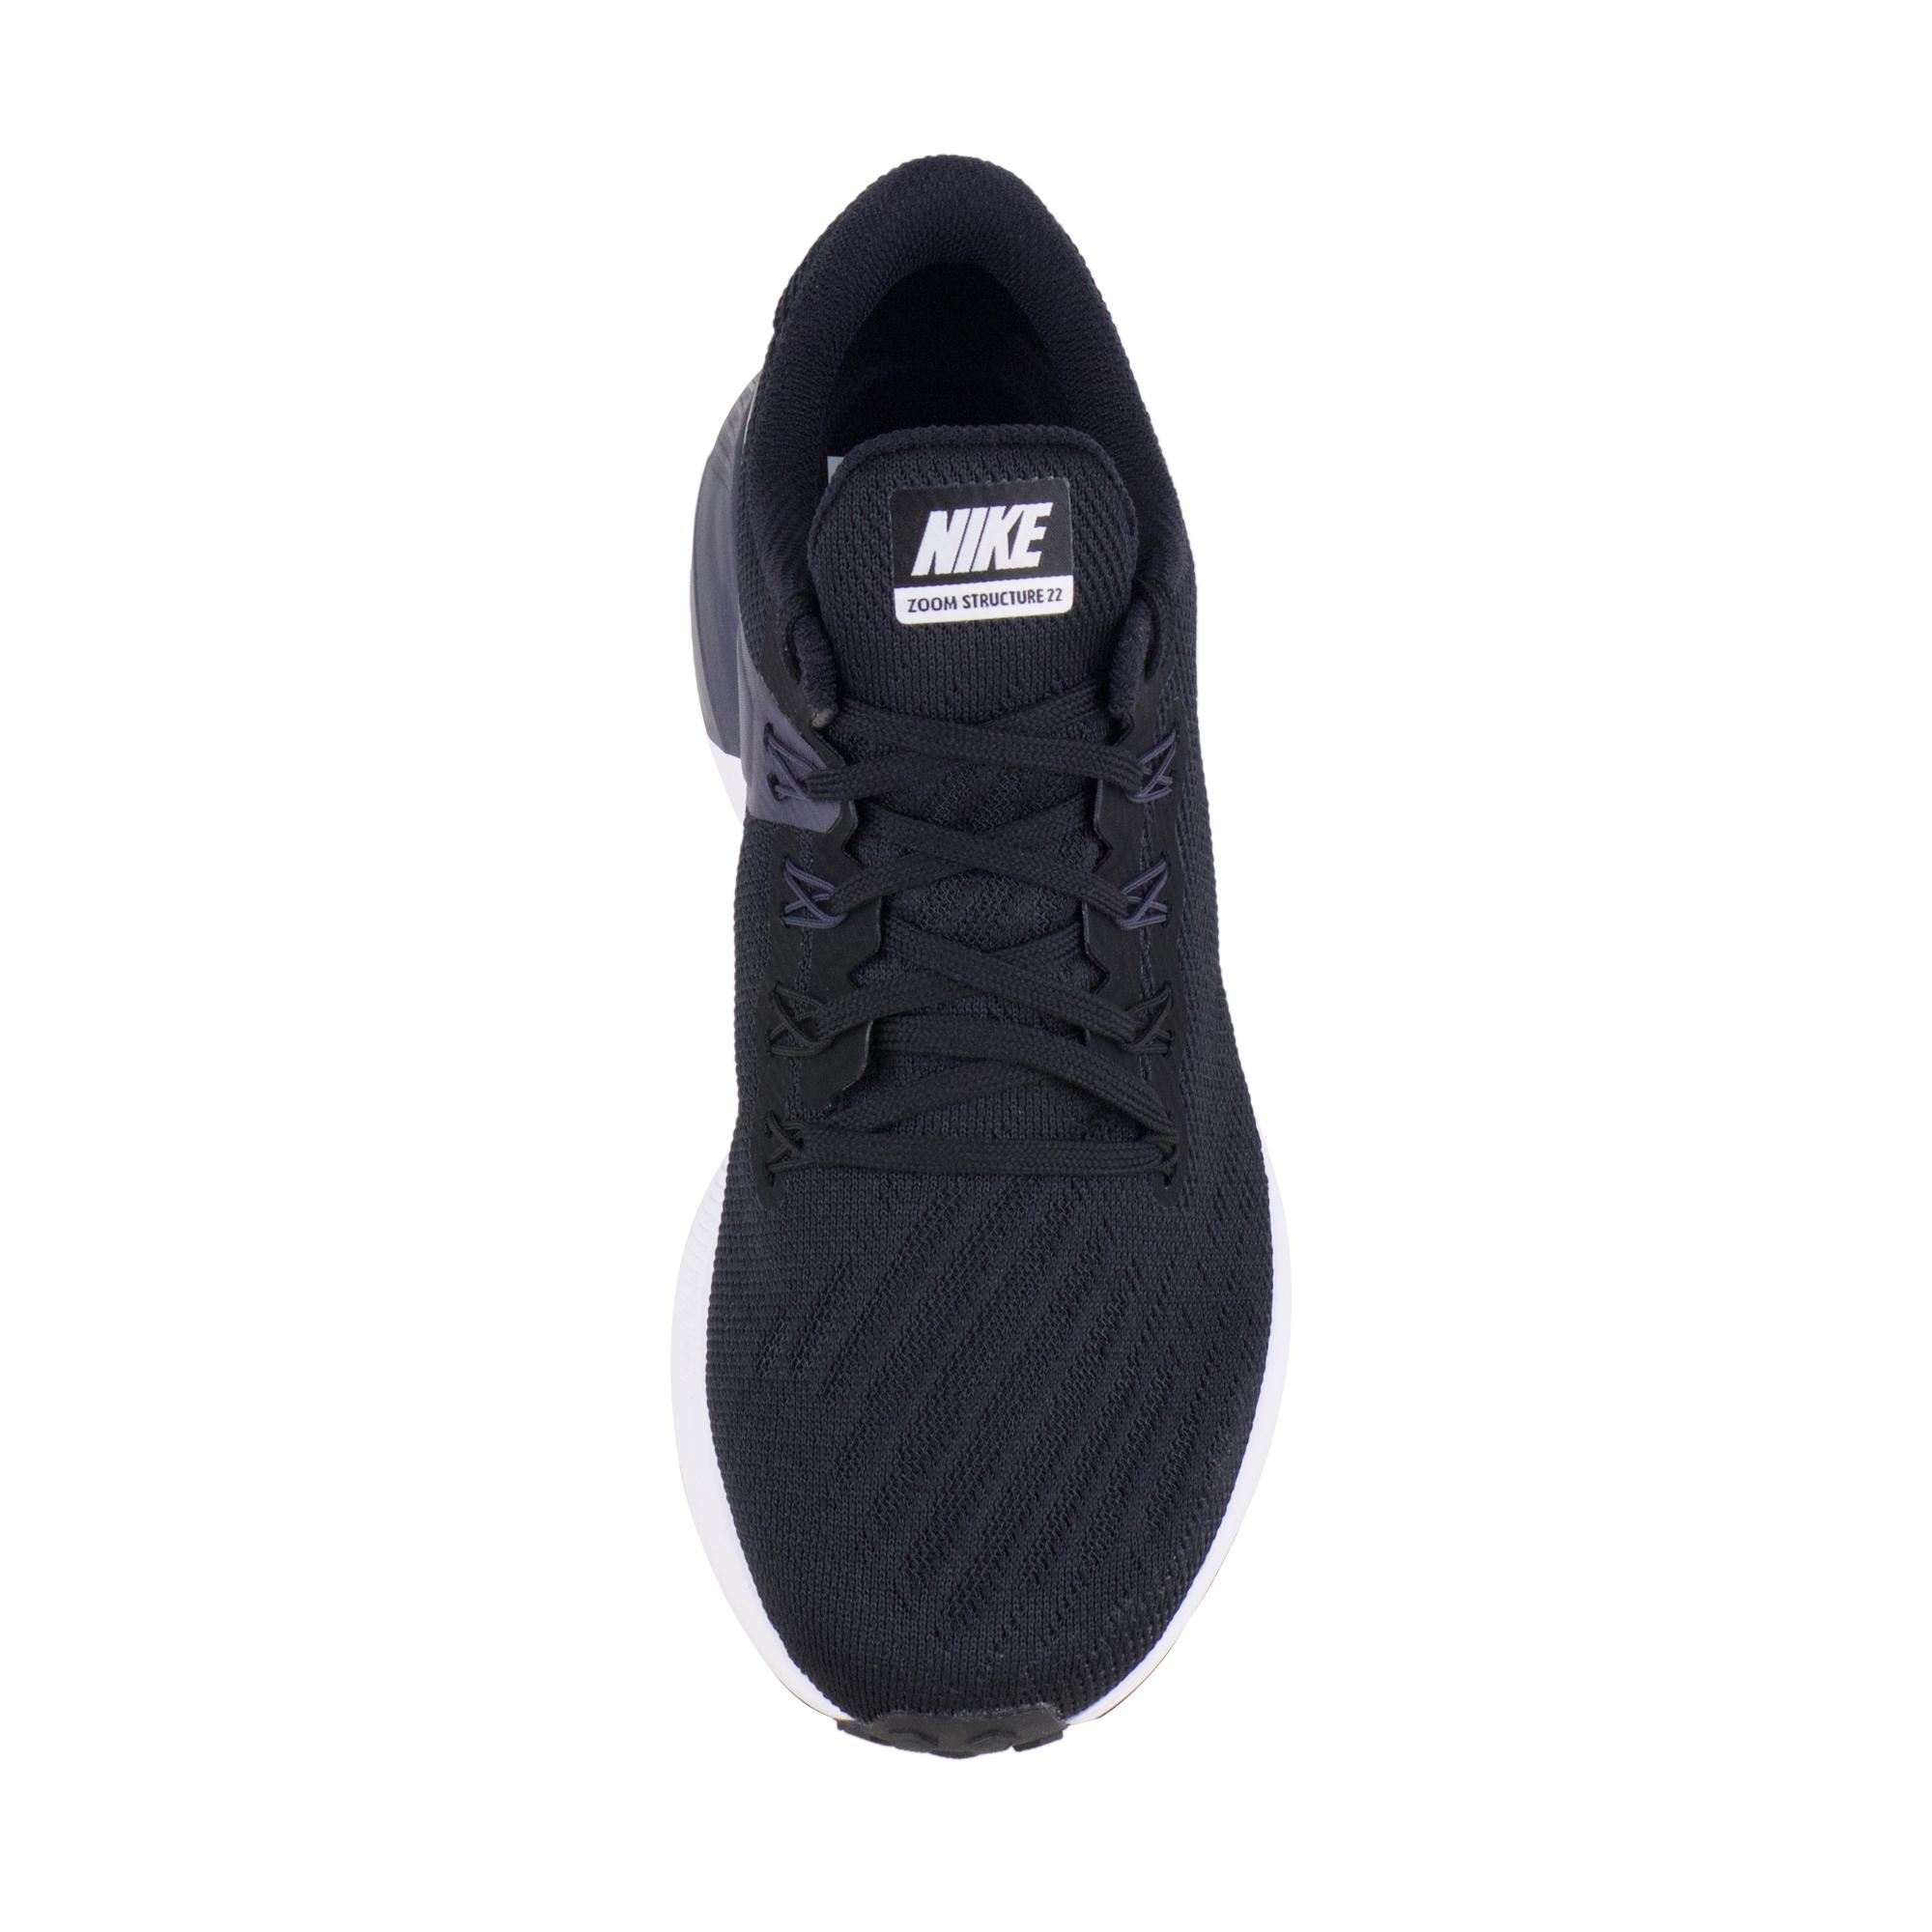 Nike Air Zoom Structure 22 Runningschuhe Damen AA1640 002